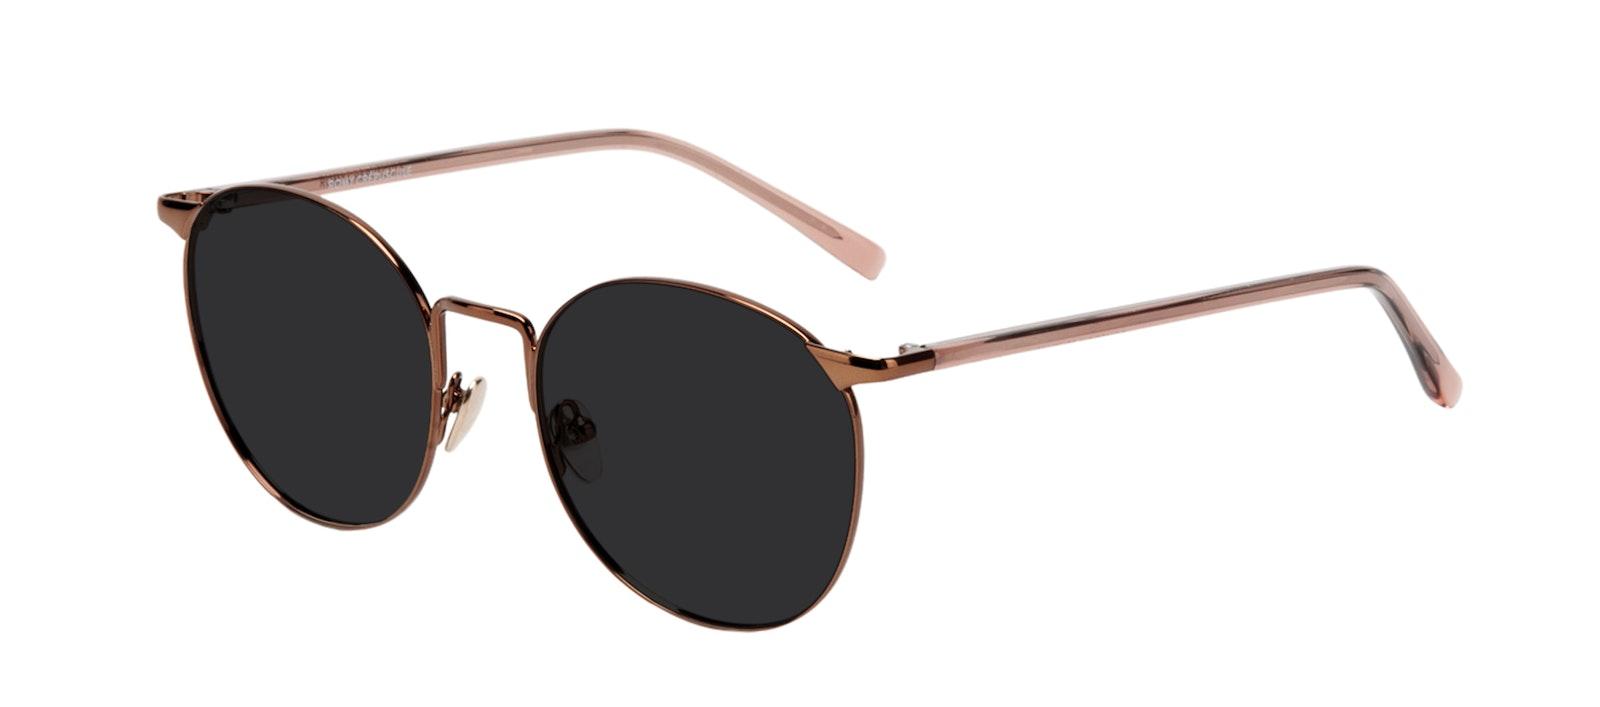 Affordable Fashion Glasses Round Sunglasses Women Romy Crepuscule Tilt